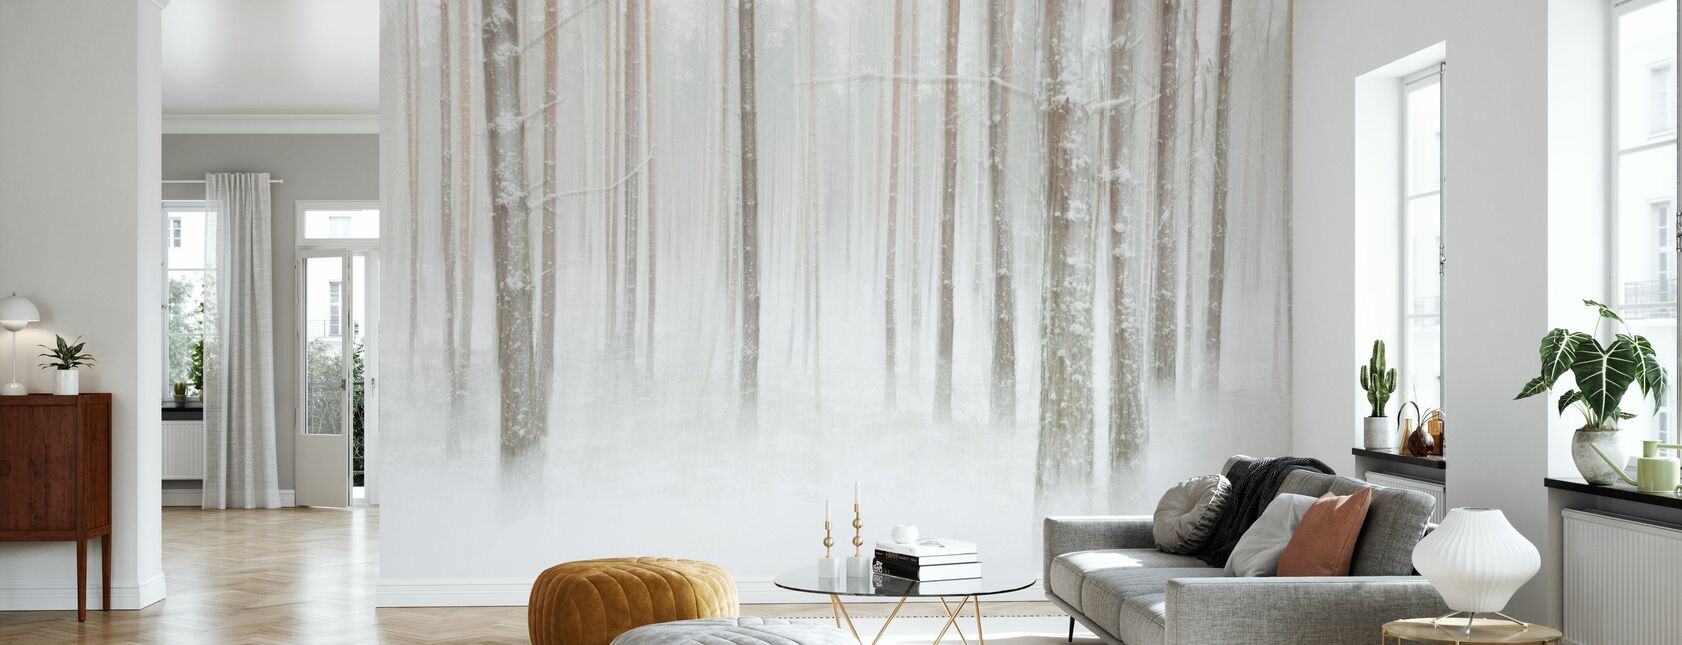 Winterforest in Svezia - Carta da parati - Salotto